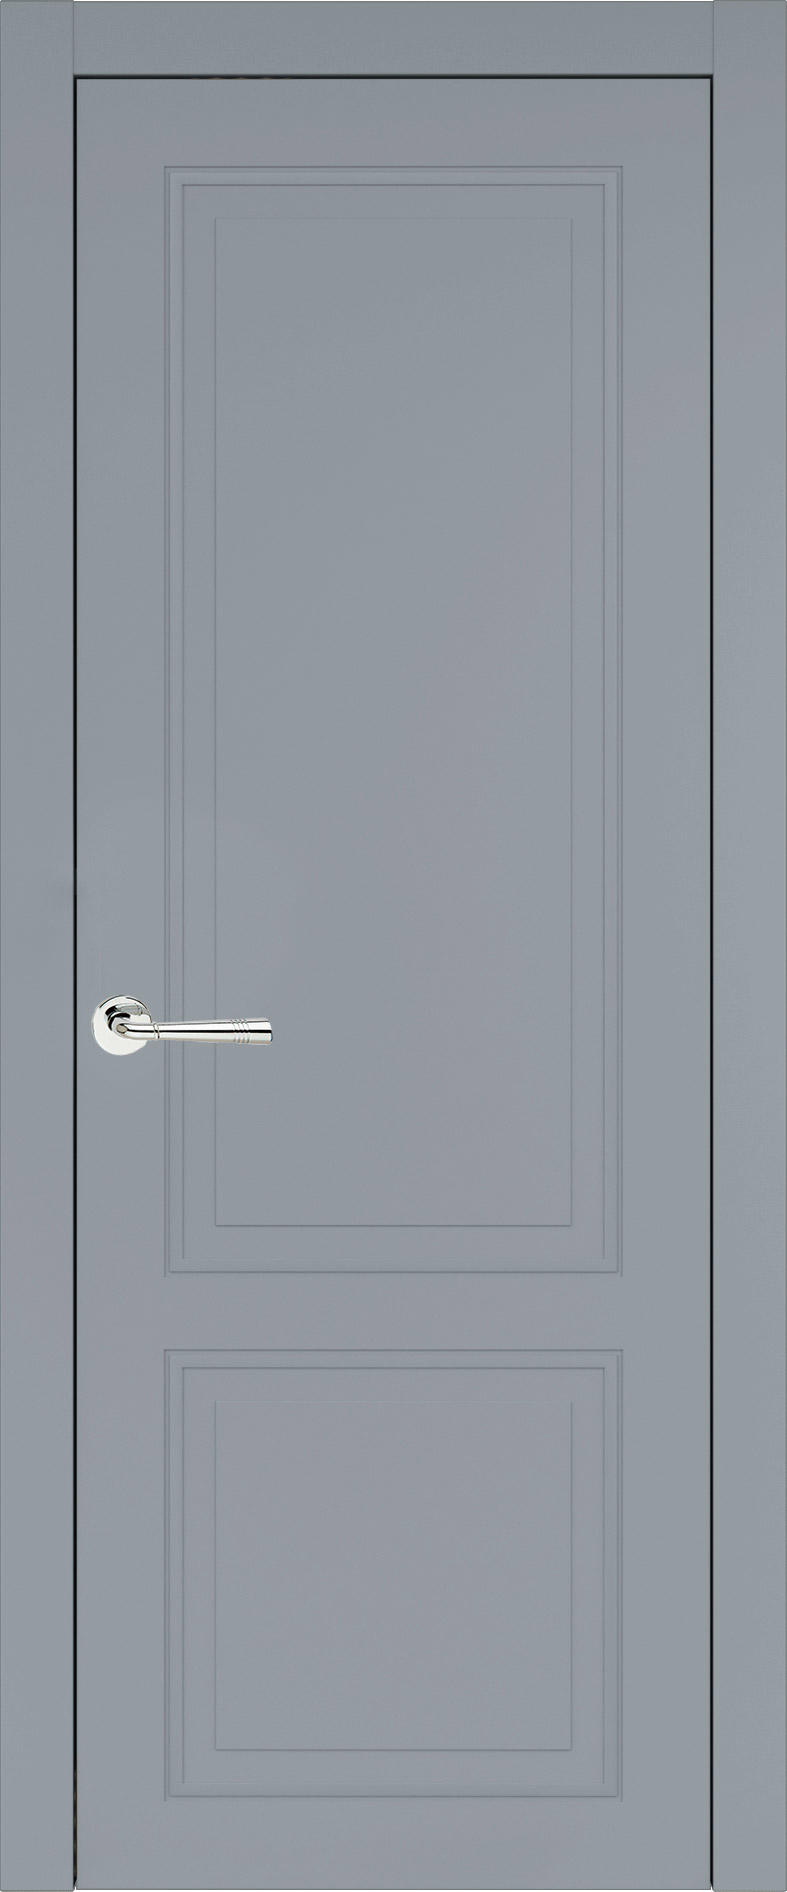 Dinastia Neo Classic цвет - Серебристо-серая эмаль (RAL 7045) Без стекла (ДГ)